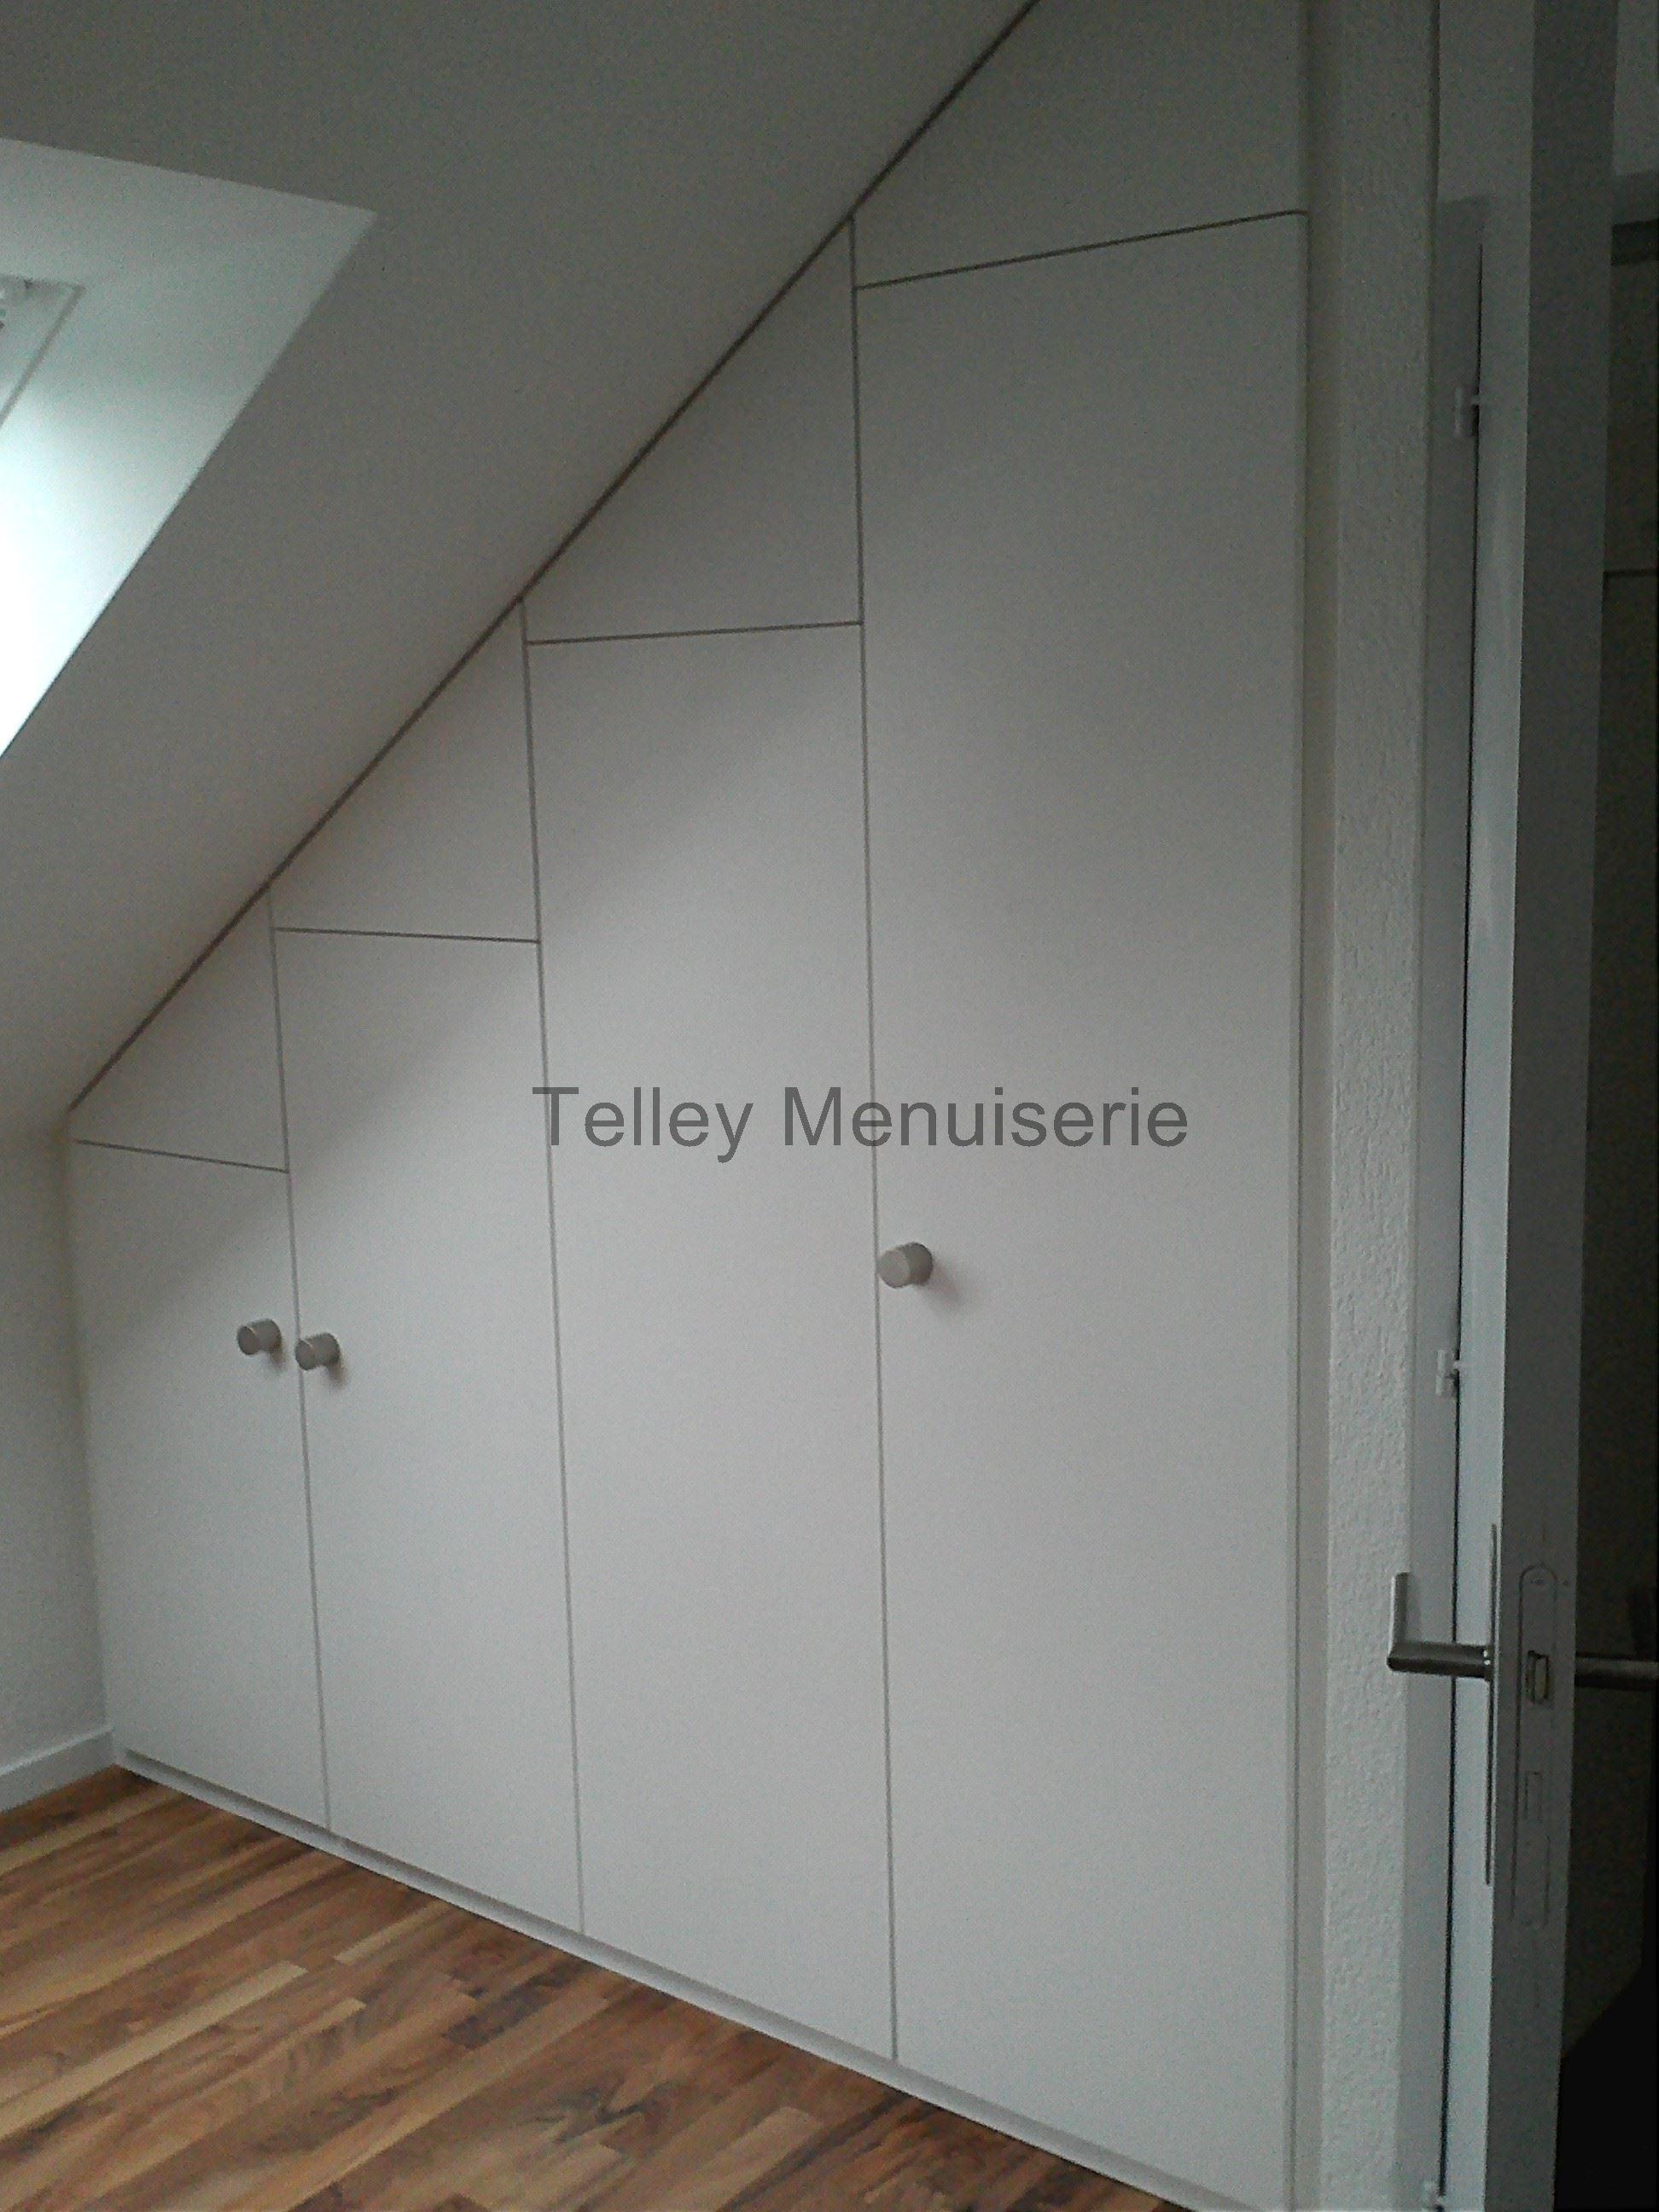 agencement int rieure armoire dressing sur mesure telley. Black Bedroom Furniture Sets. Home Design Ideas